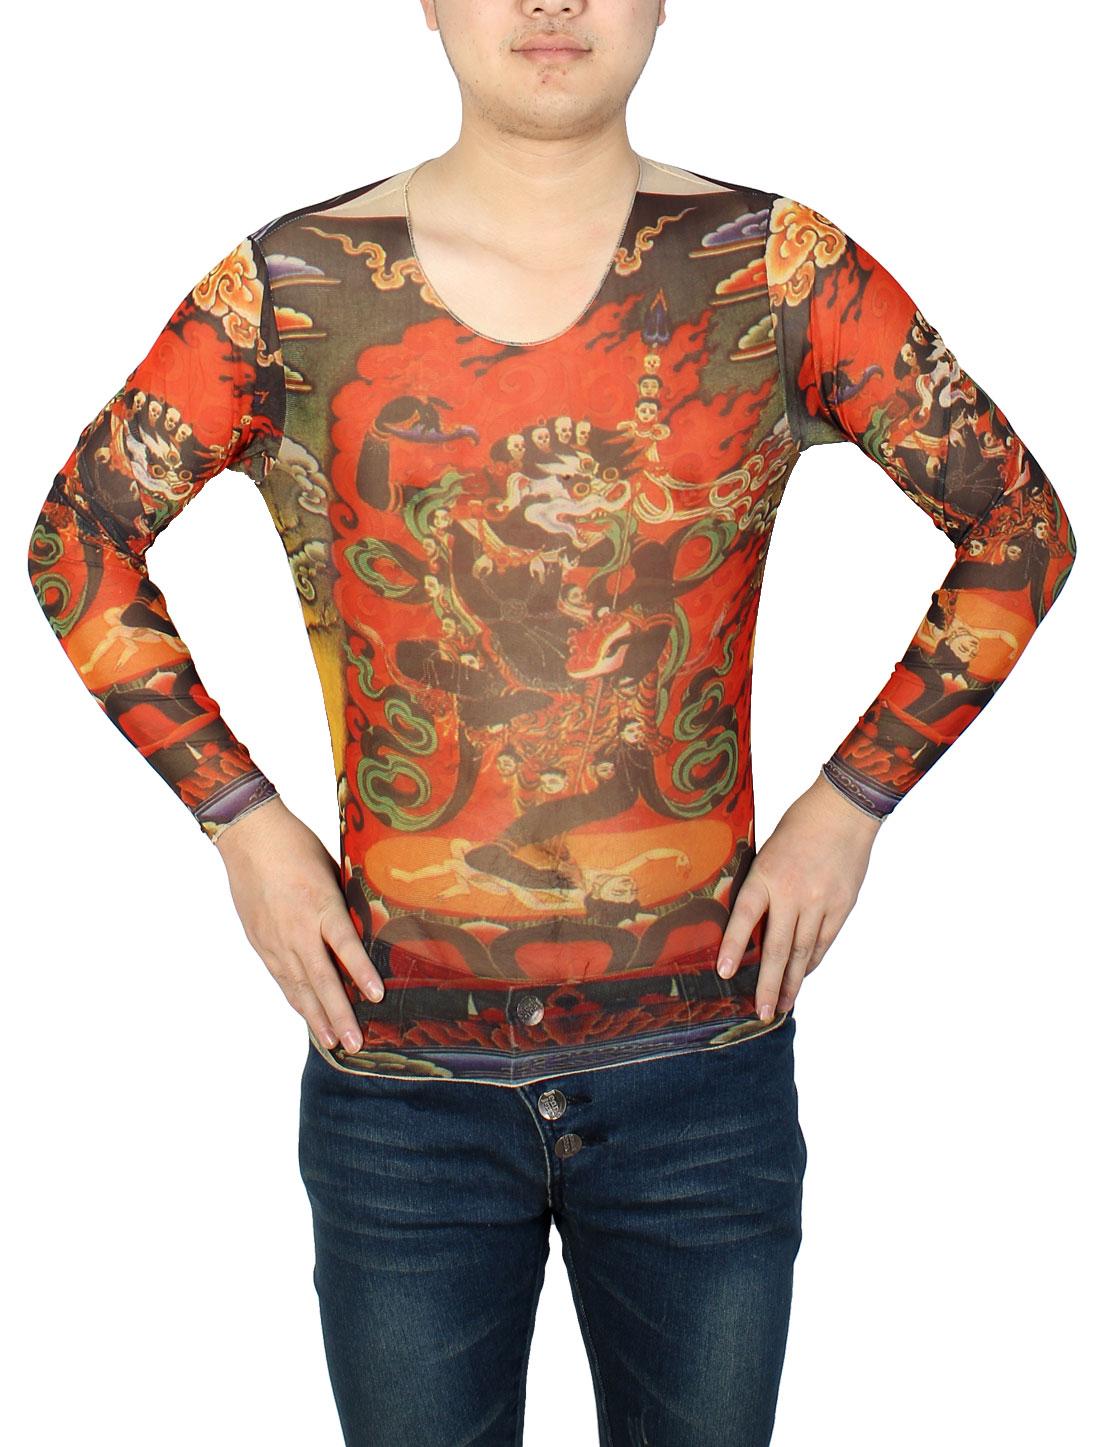 Man Long Sleeve Semi Sheer Orange Red Flowers Print Elastic Tattoo T-Shirt S